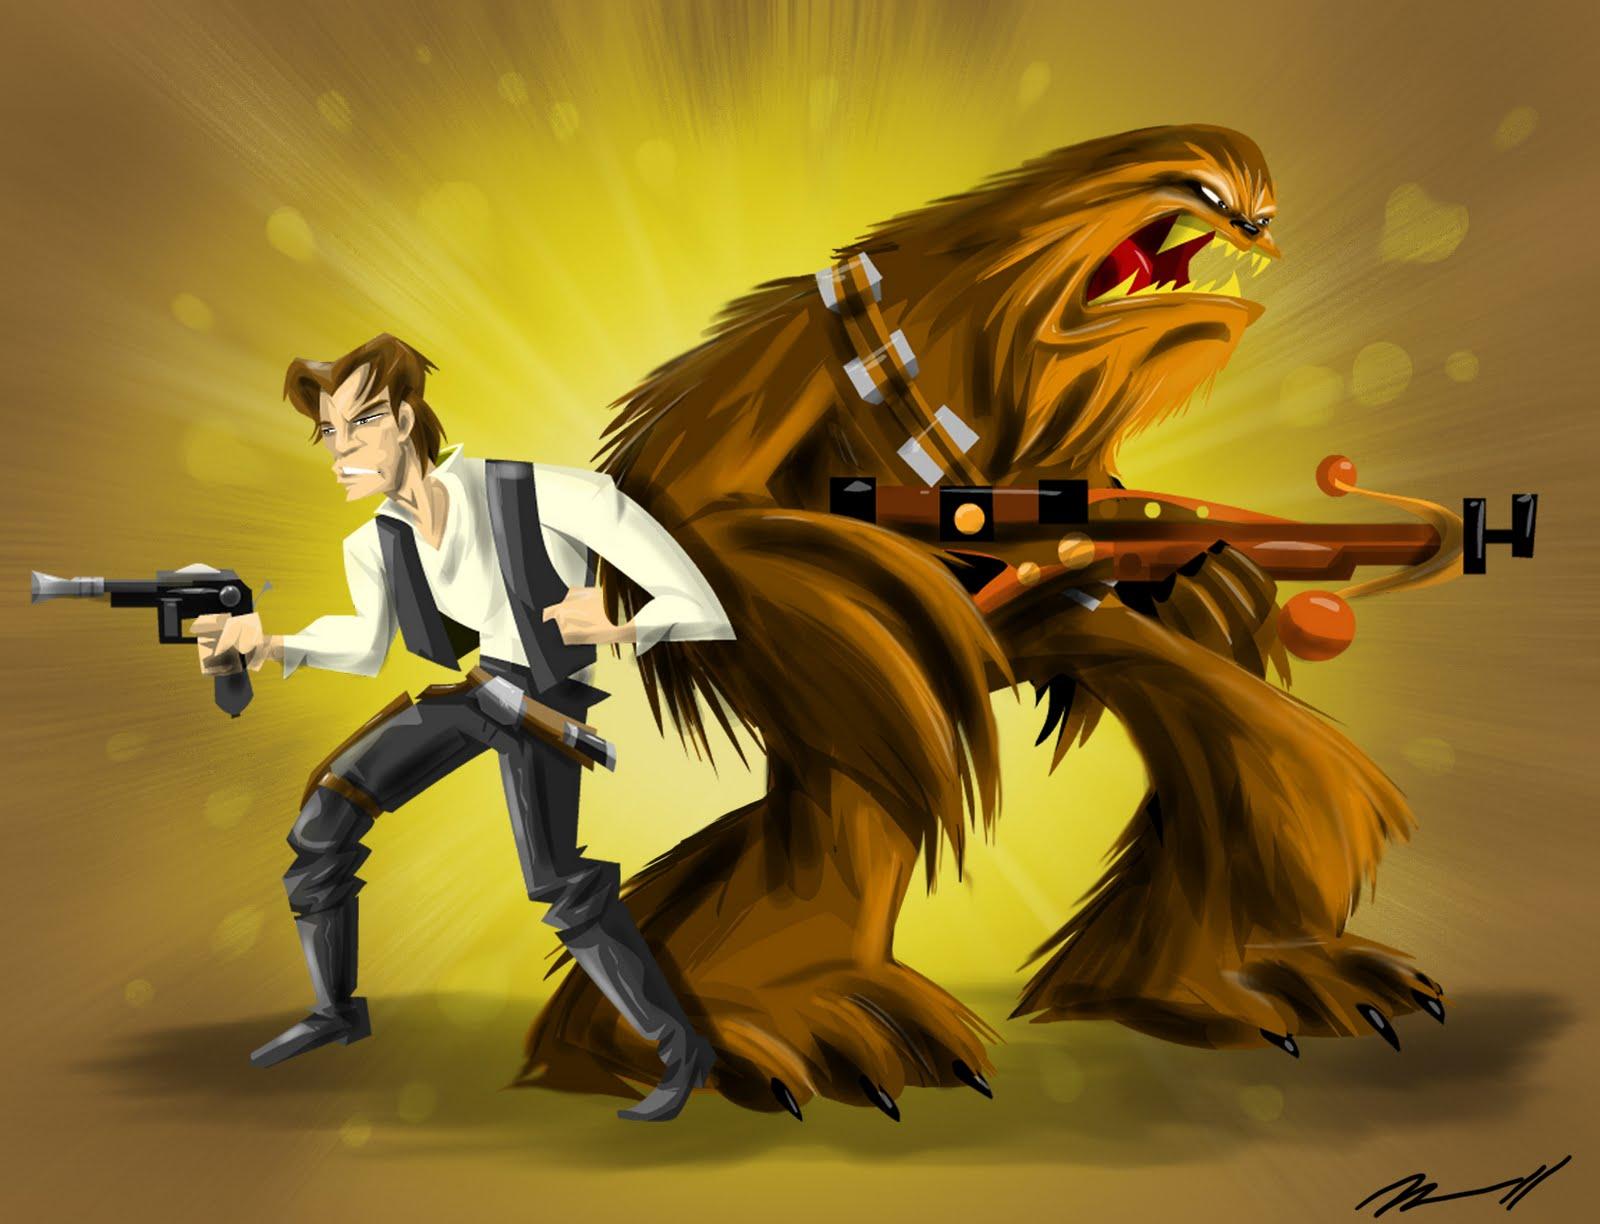 Star Wars Goodfellas